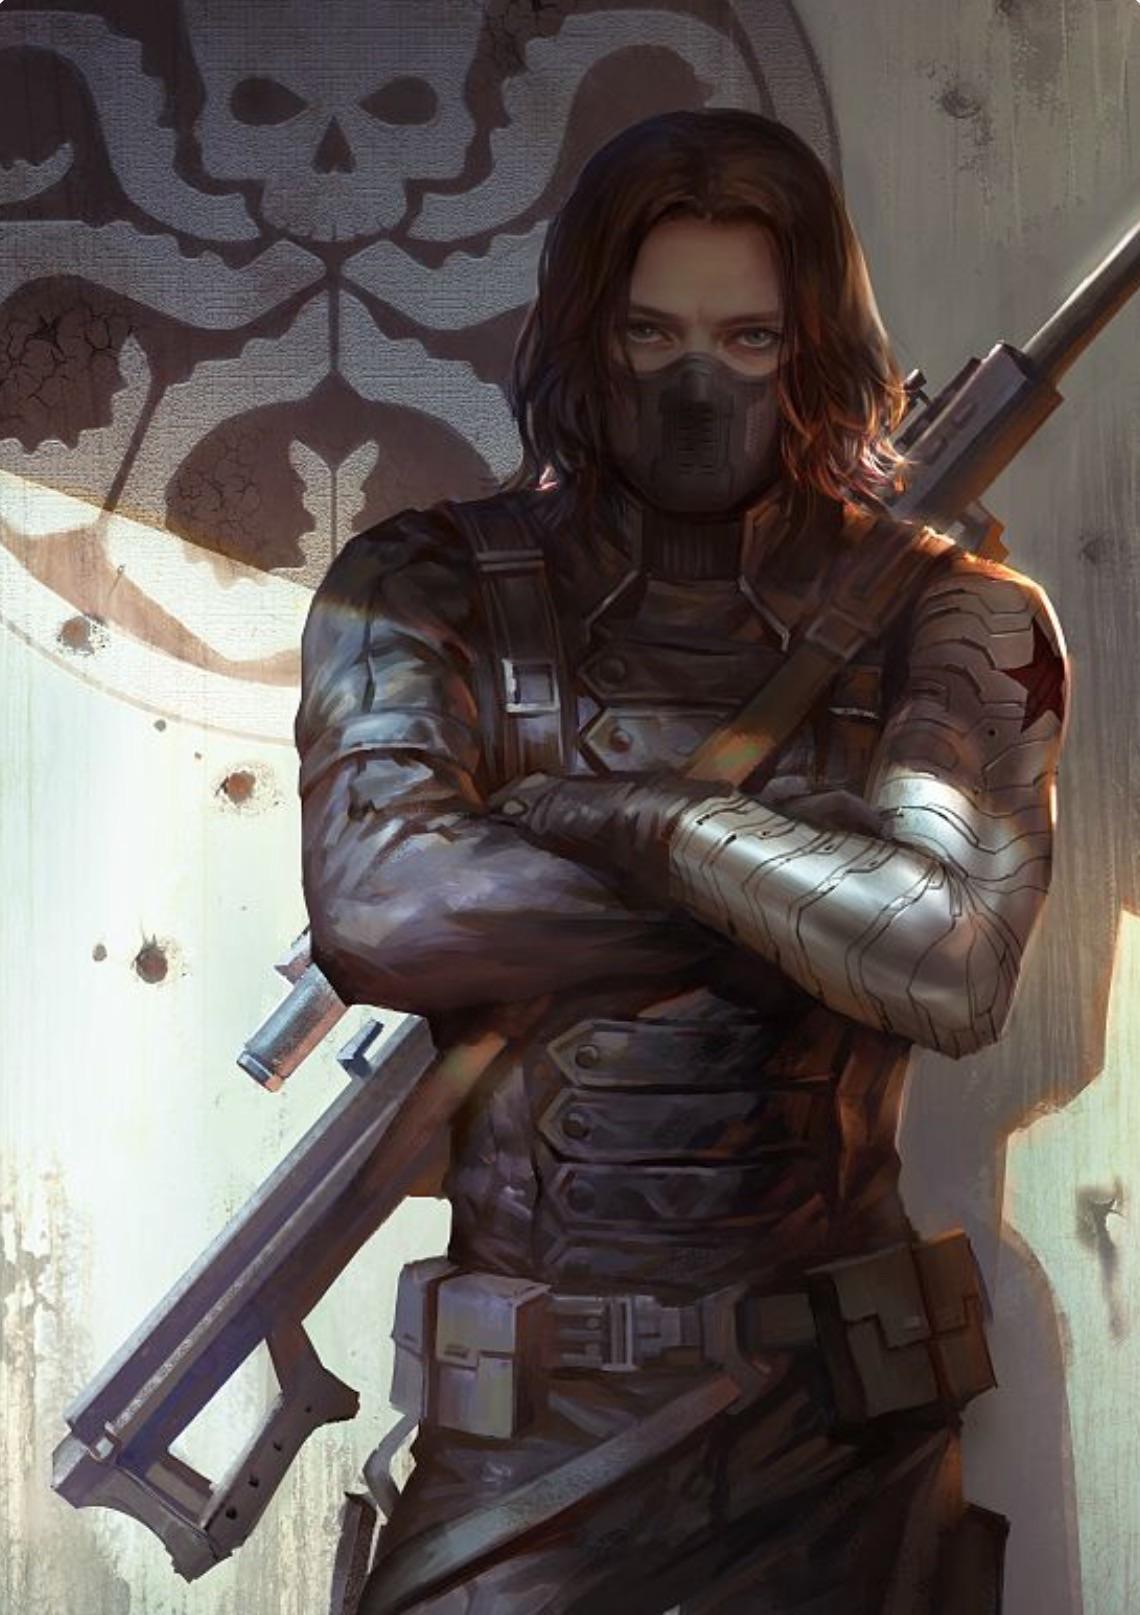 Do you think Bucky Barnes is a villain? - Question